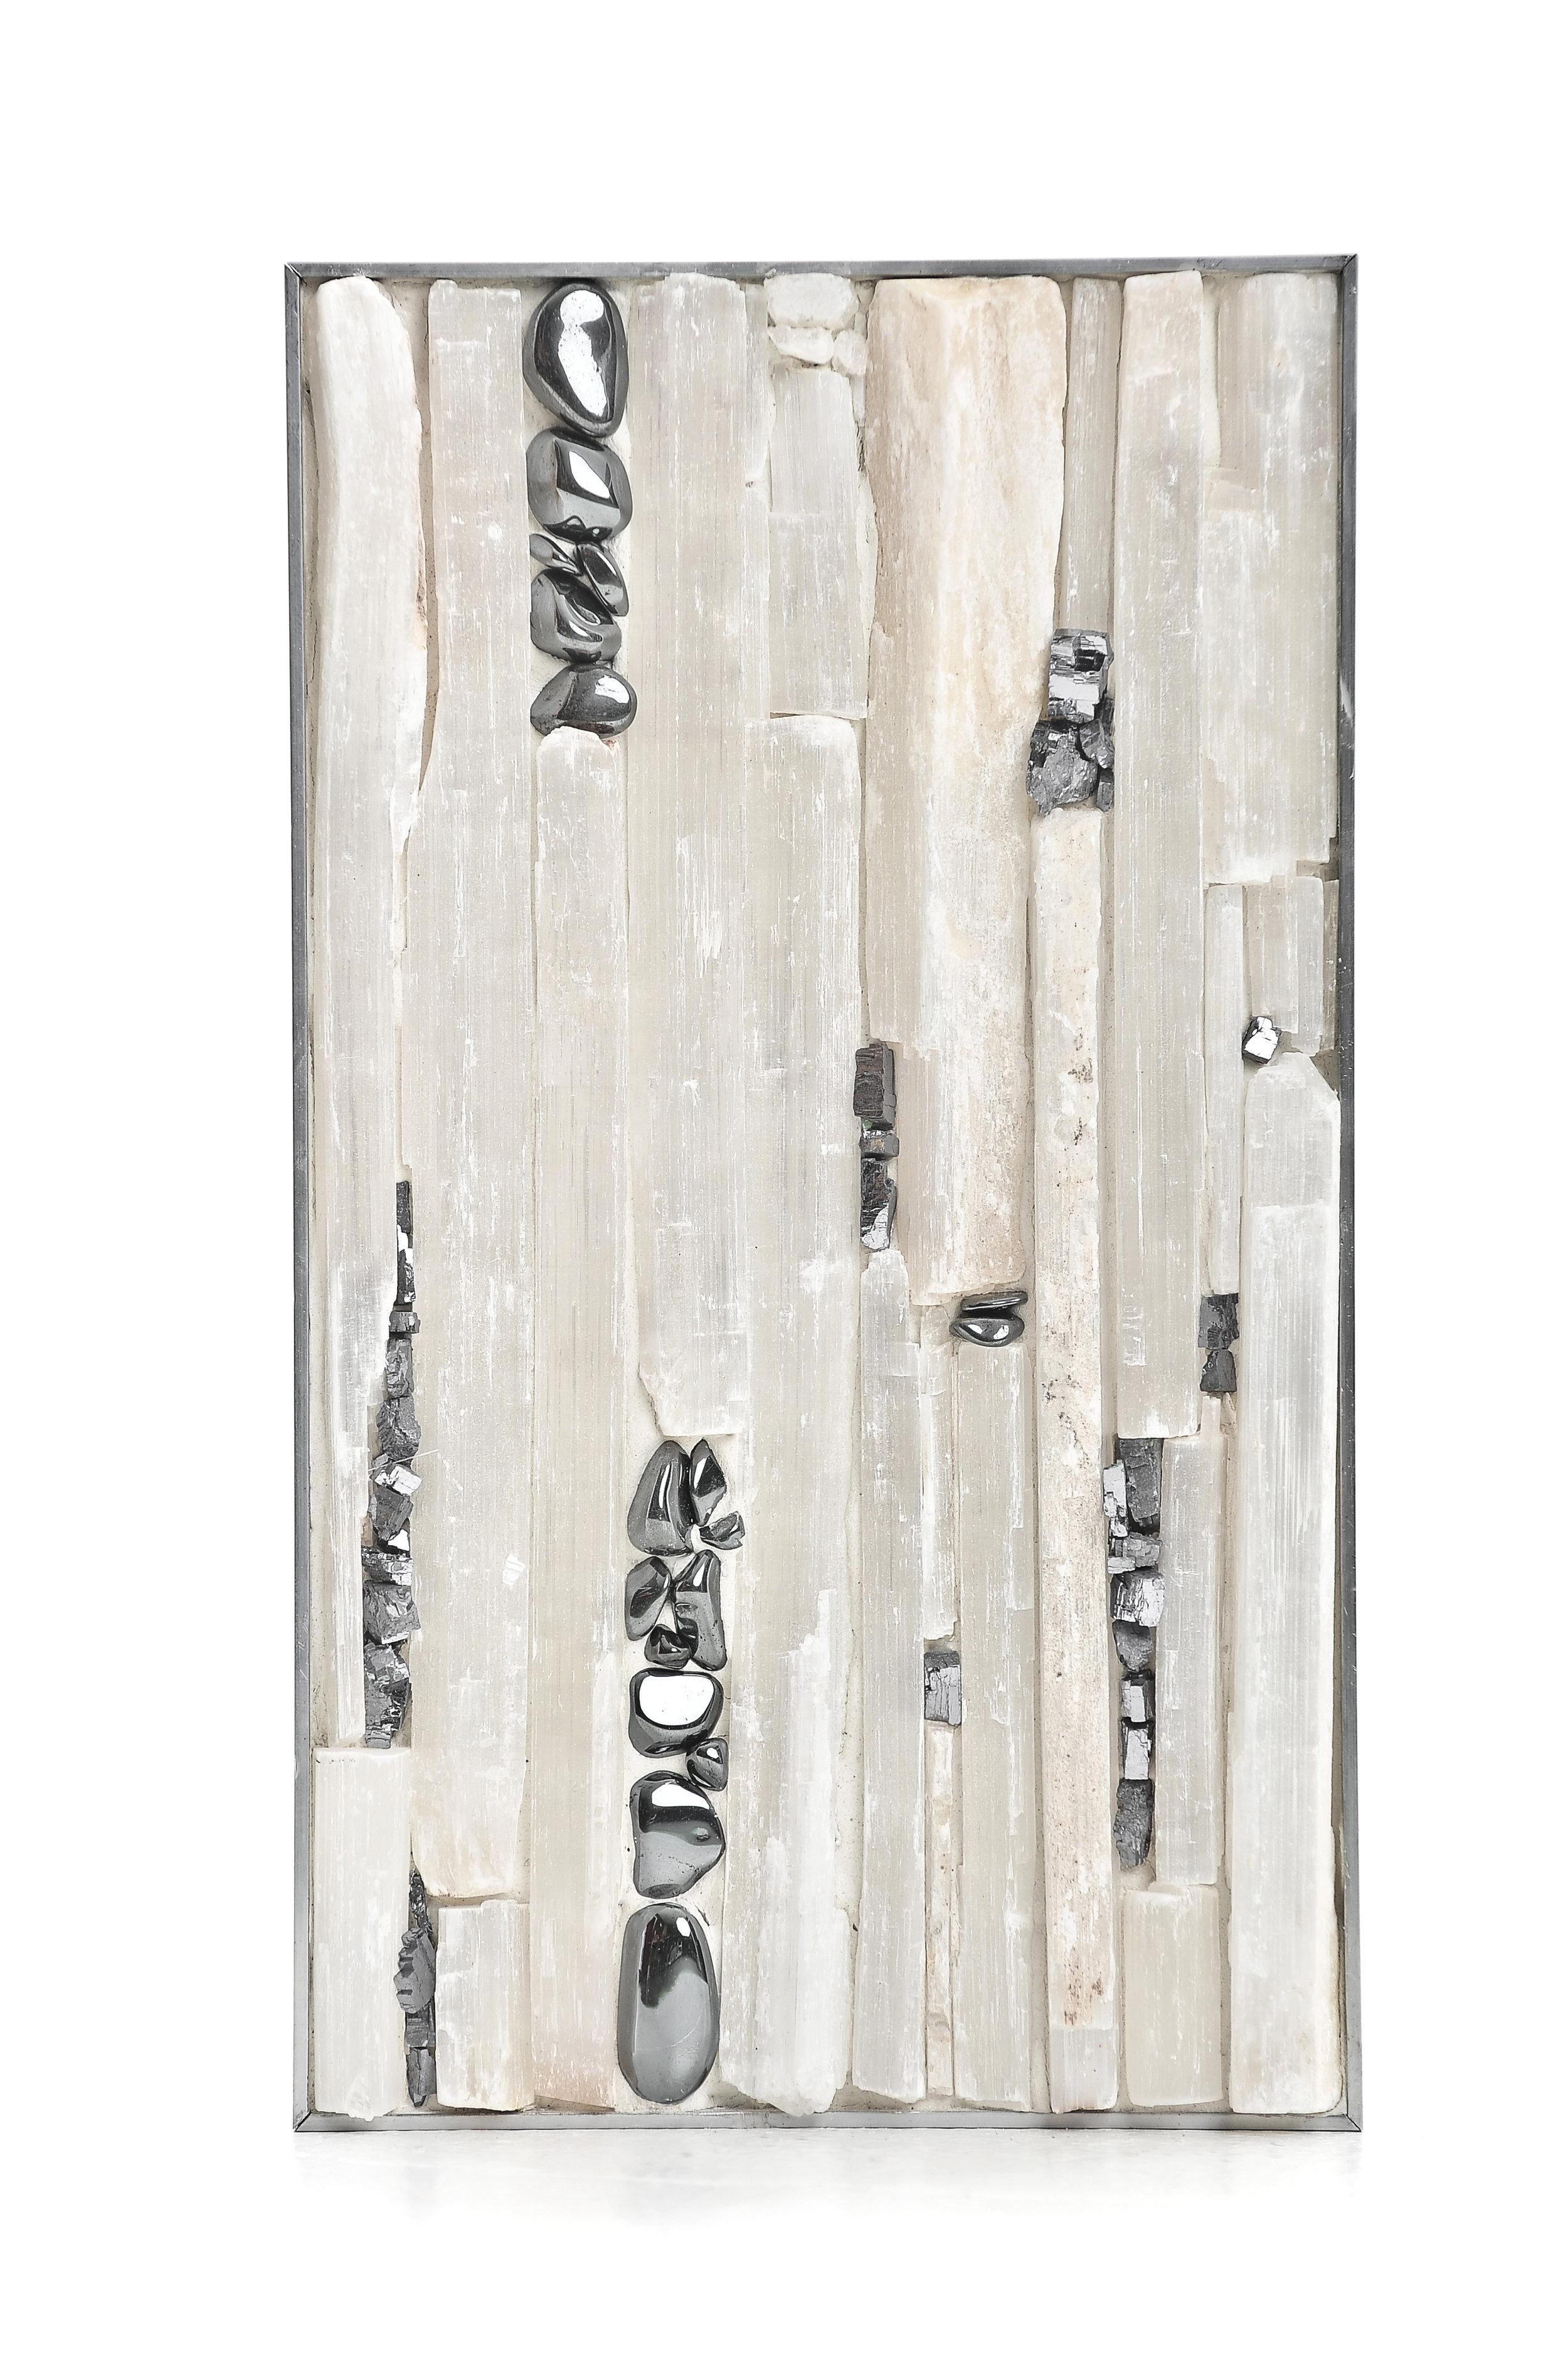 Sticks and Stones DSC_3439.JPG